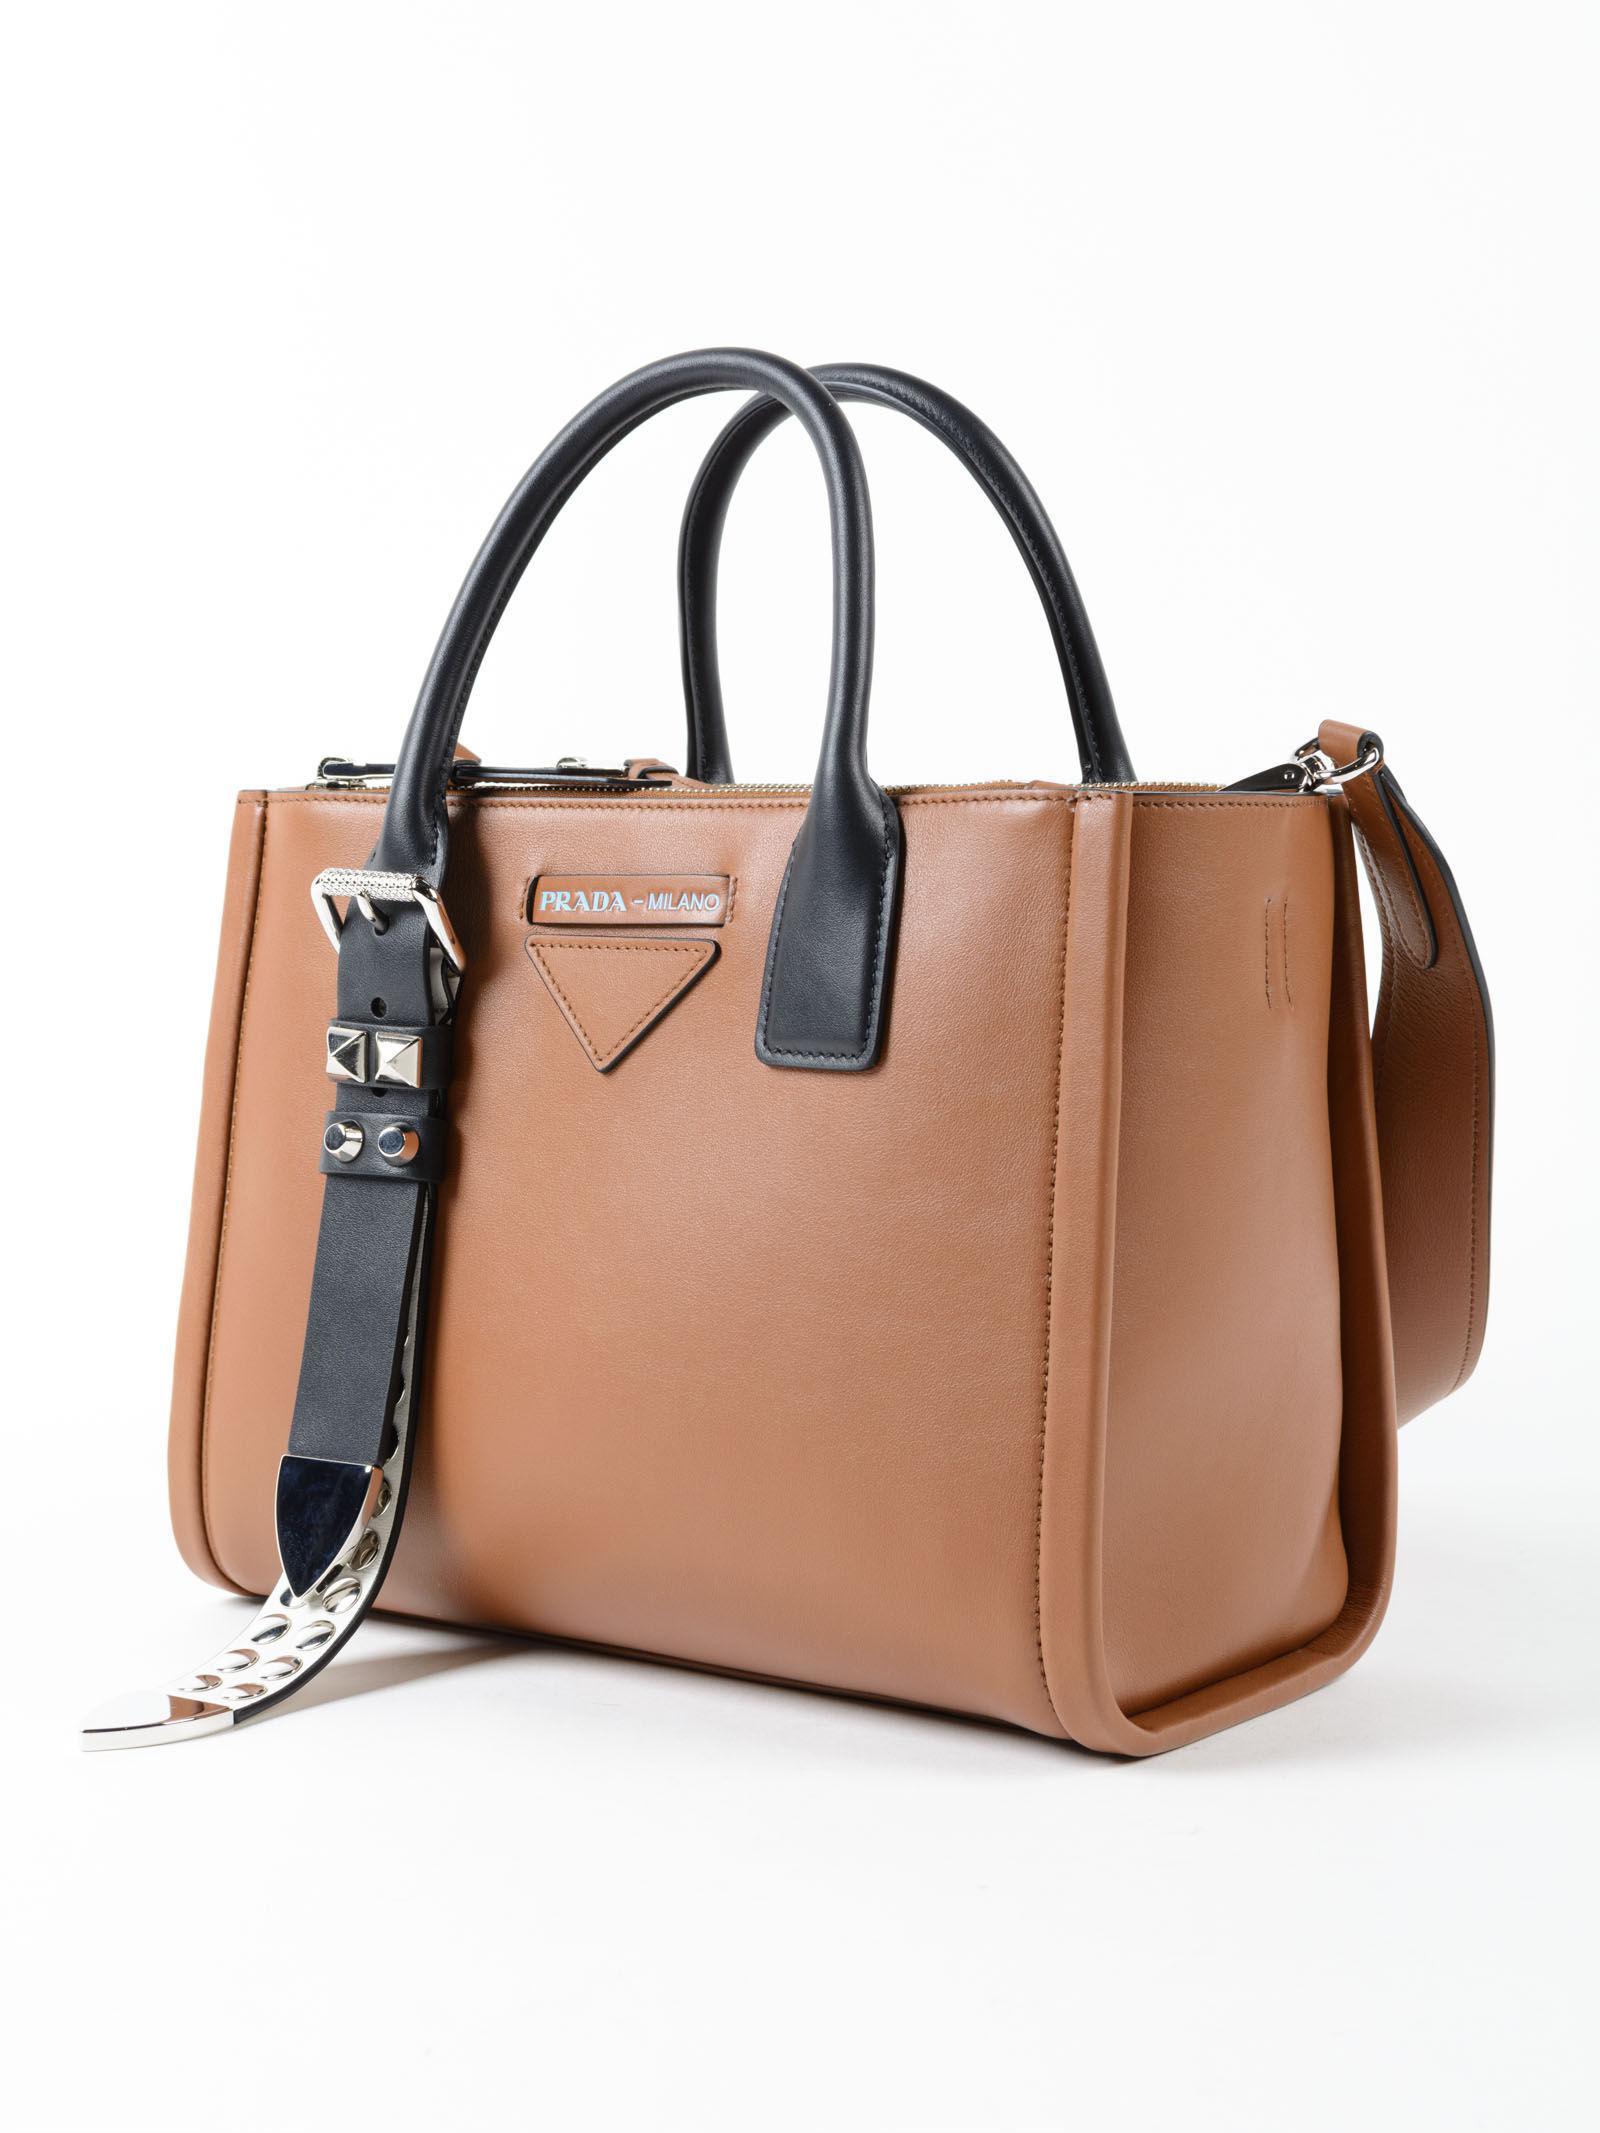 c3fc0e578a Prada Grace Lux Handbag in Brown - Lyst